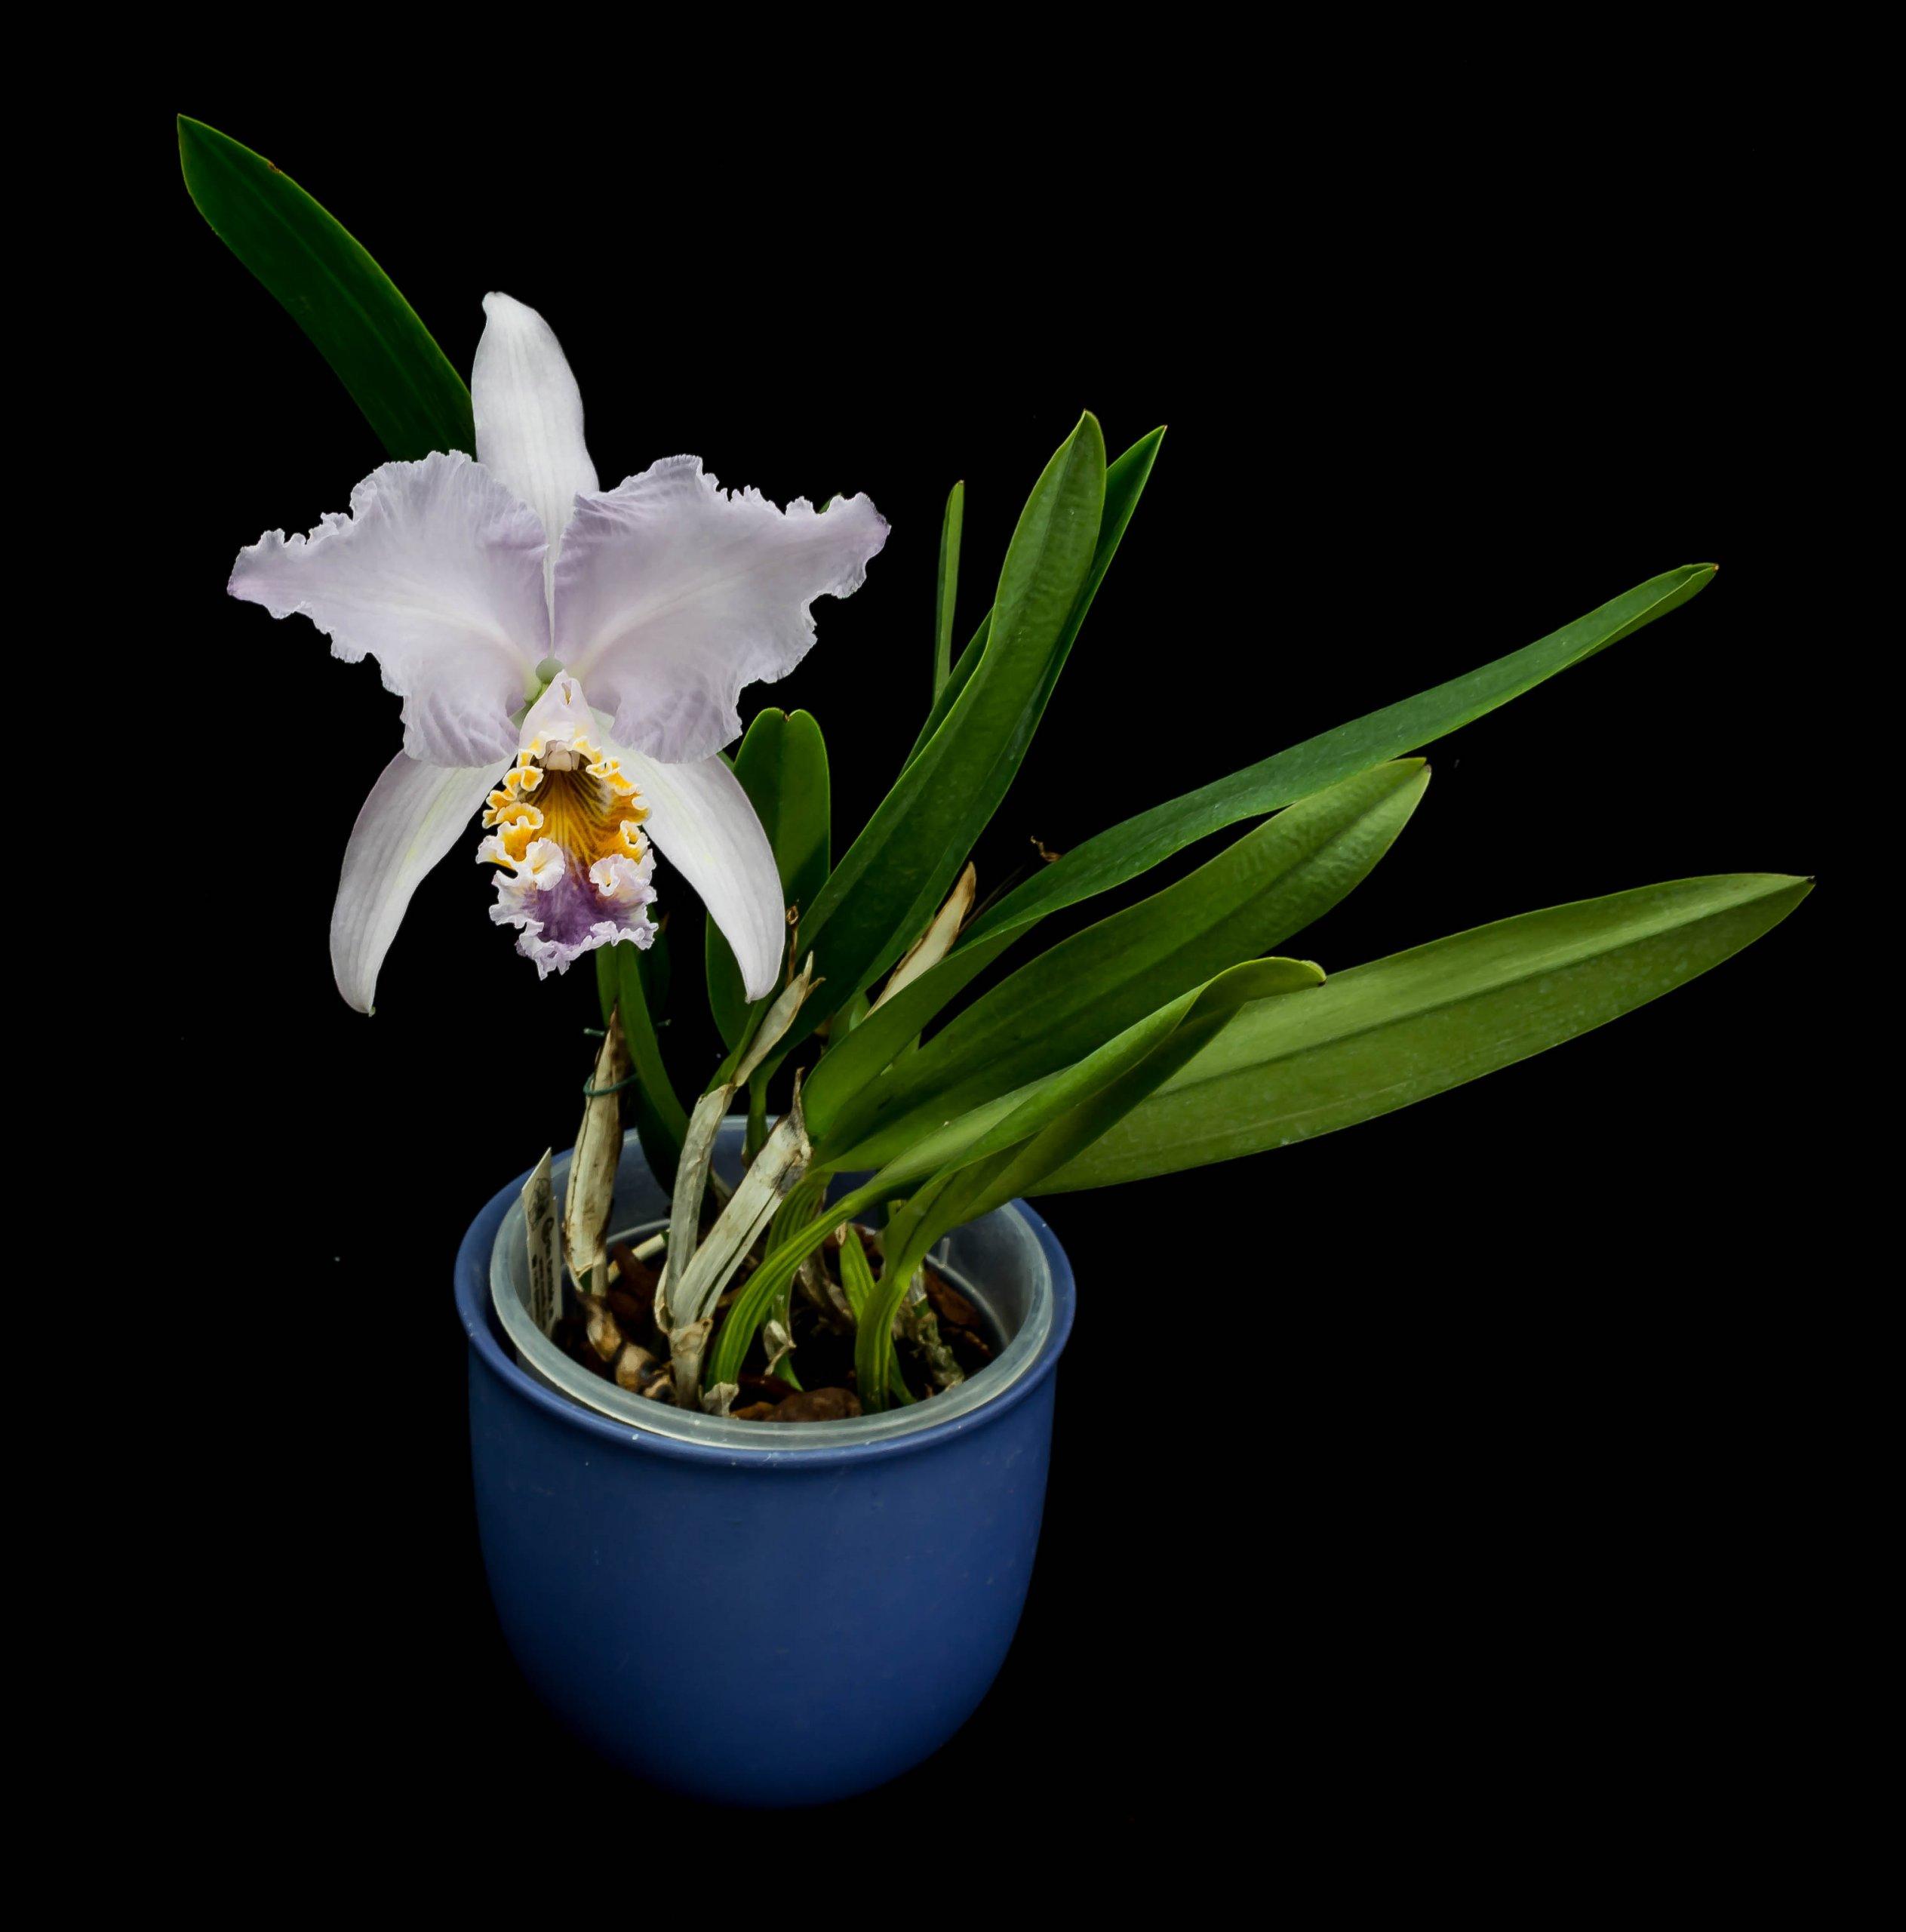 16052021 Cattleya mossiae var. coerulea (1).jpg